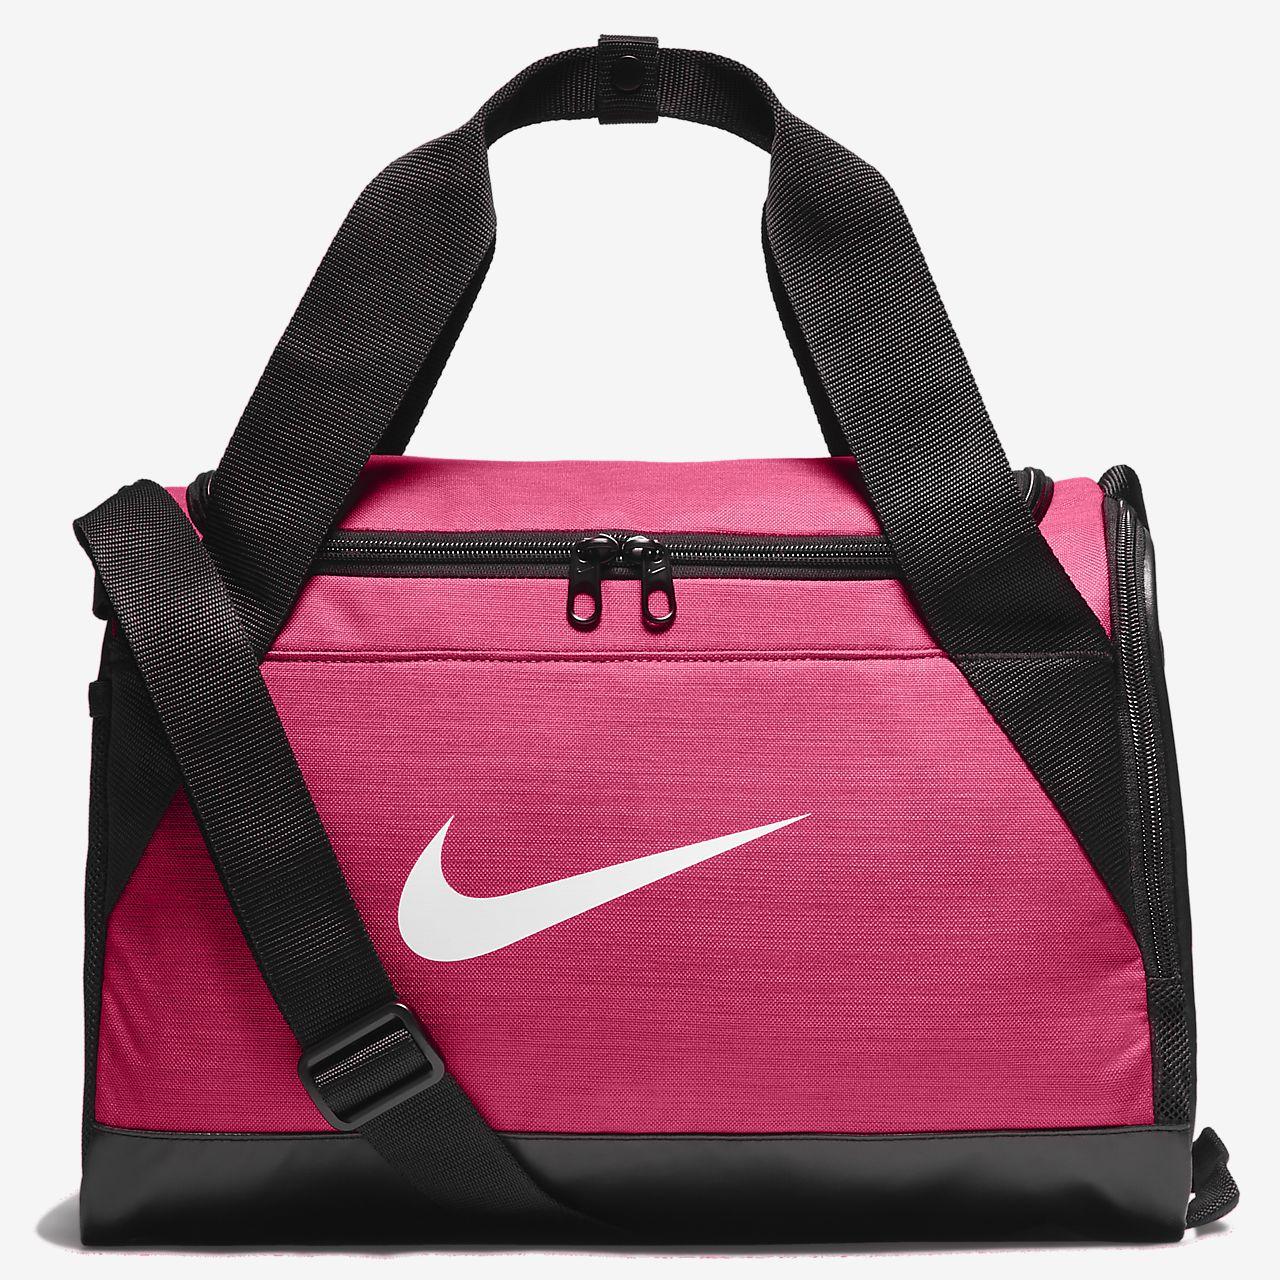 0f3a29ed31a6 Nike Brasilia (Extra Small) Training Duffel Bag. Nike.com AU